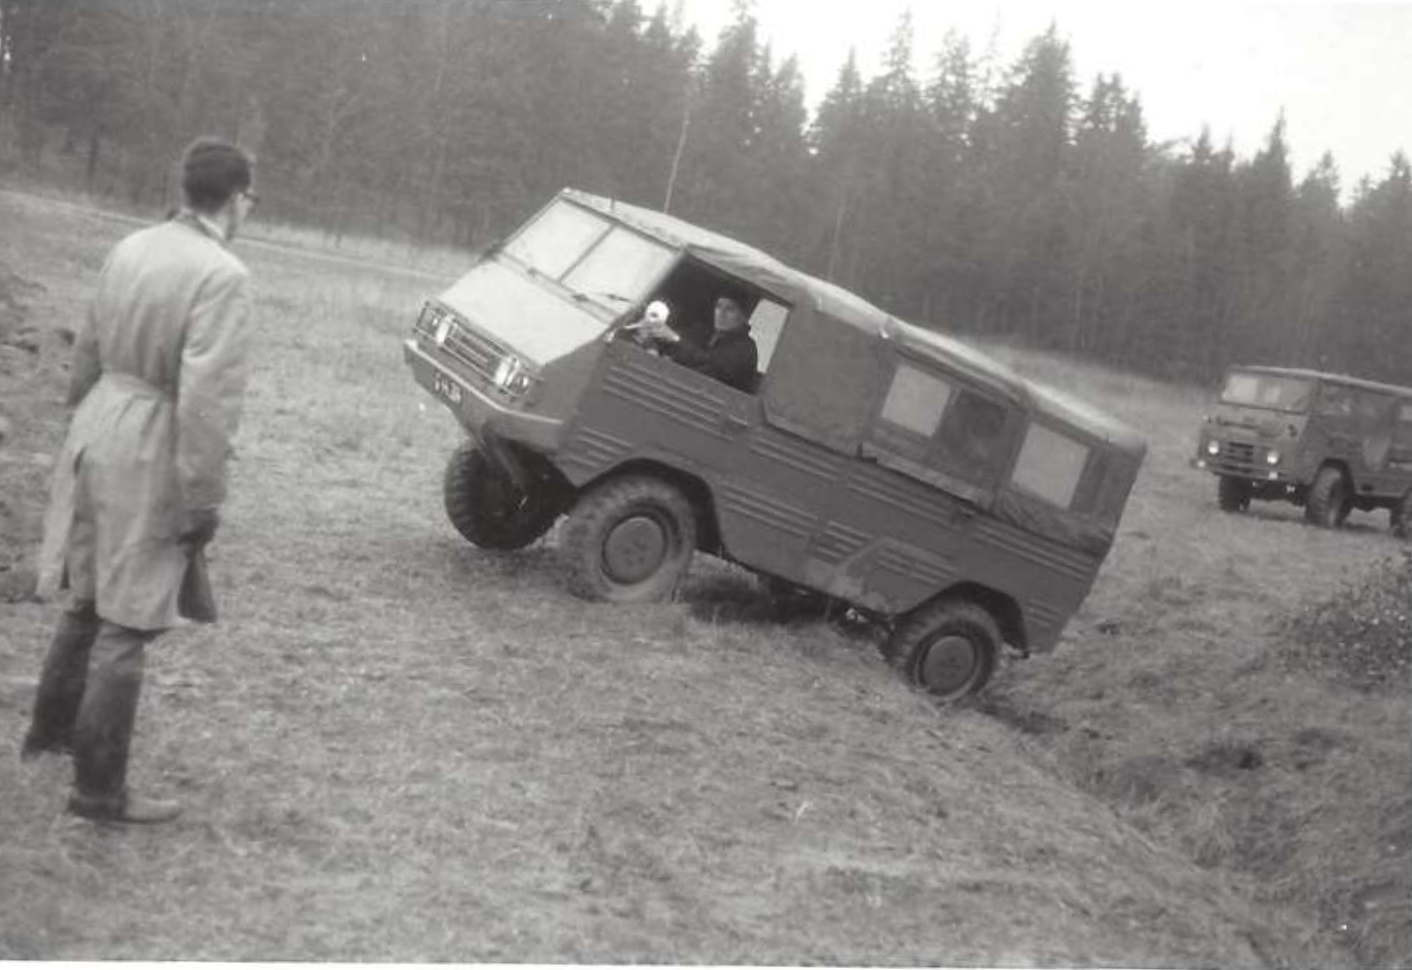 Pinzgauer vs Lapplander (1966)